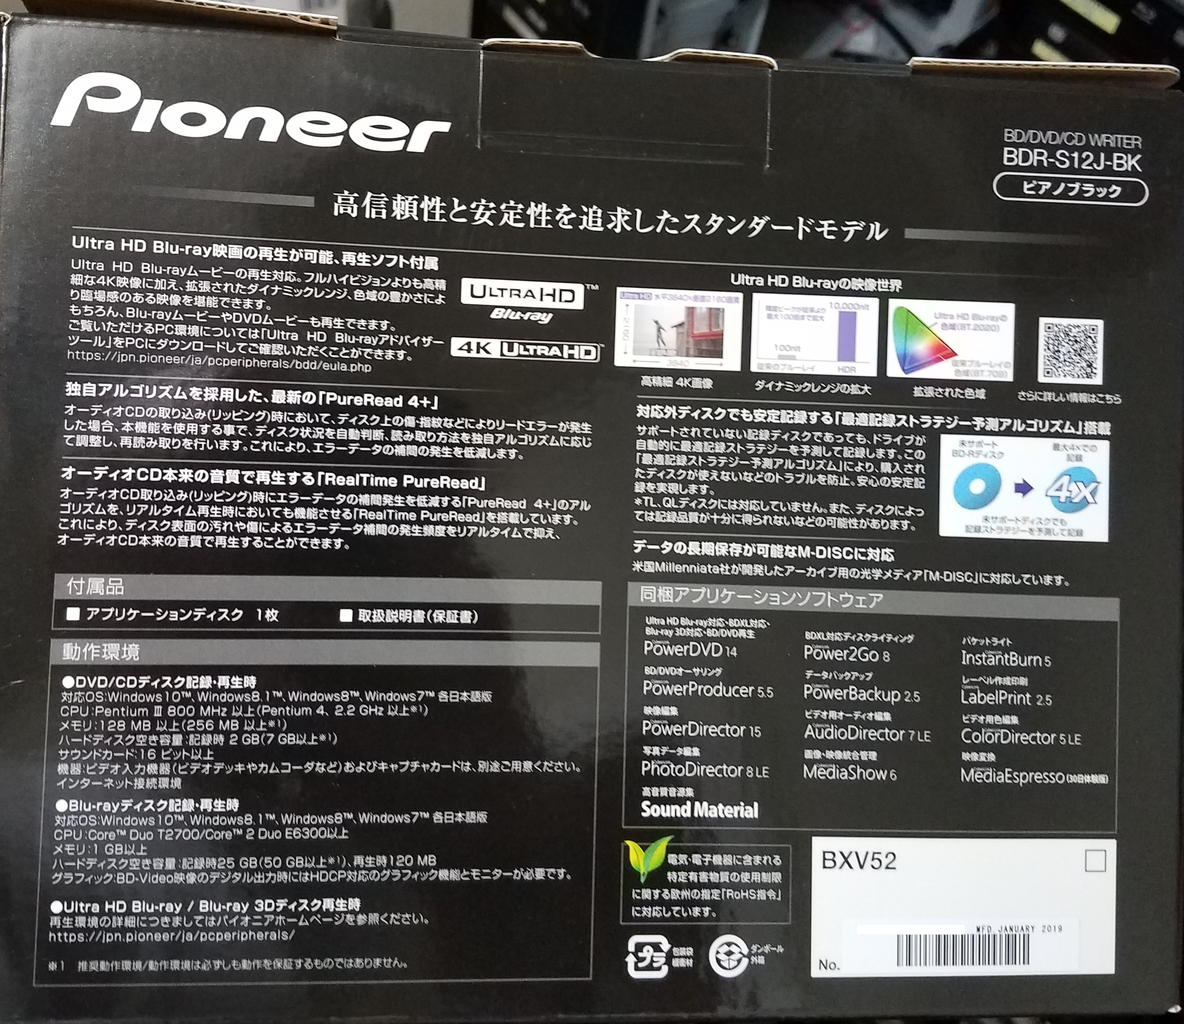 https://forum.cdrinfo.pl/attachments/f107/133668d1551419795-pioneer-bdr-s12j-bk-bdr-s12j-x-bdr-212-ultra-hd-blu-ray-box-back.jpg